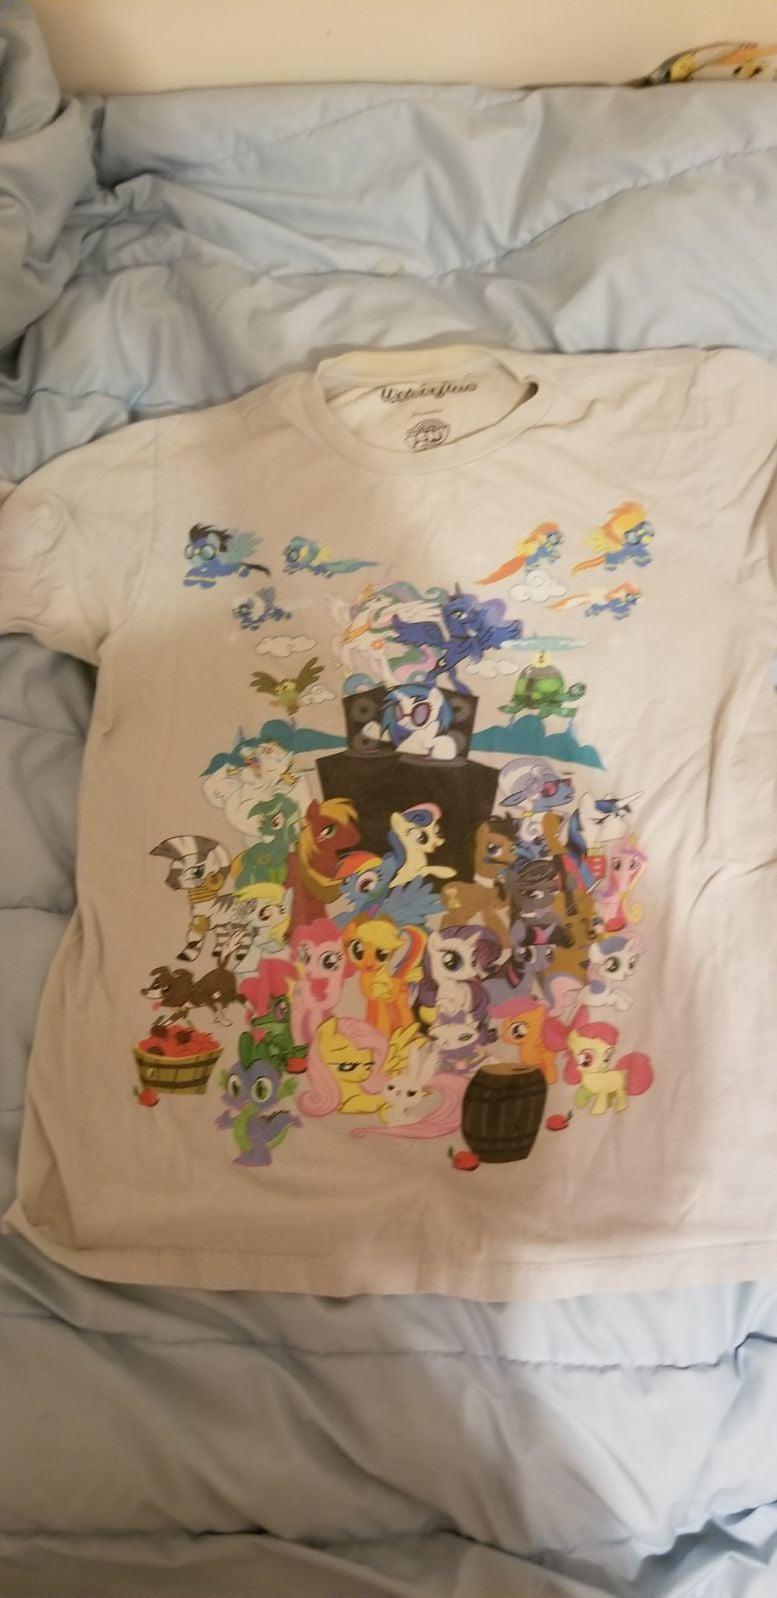 my little pony friendship is magic shirt